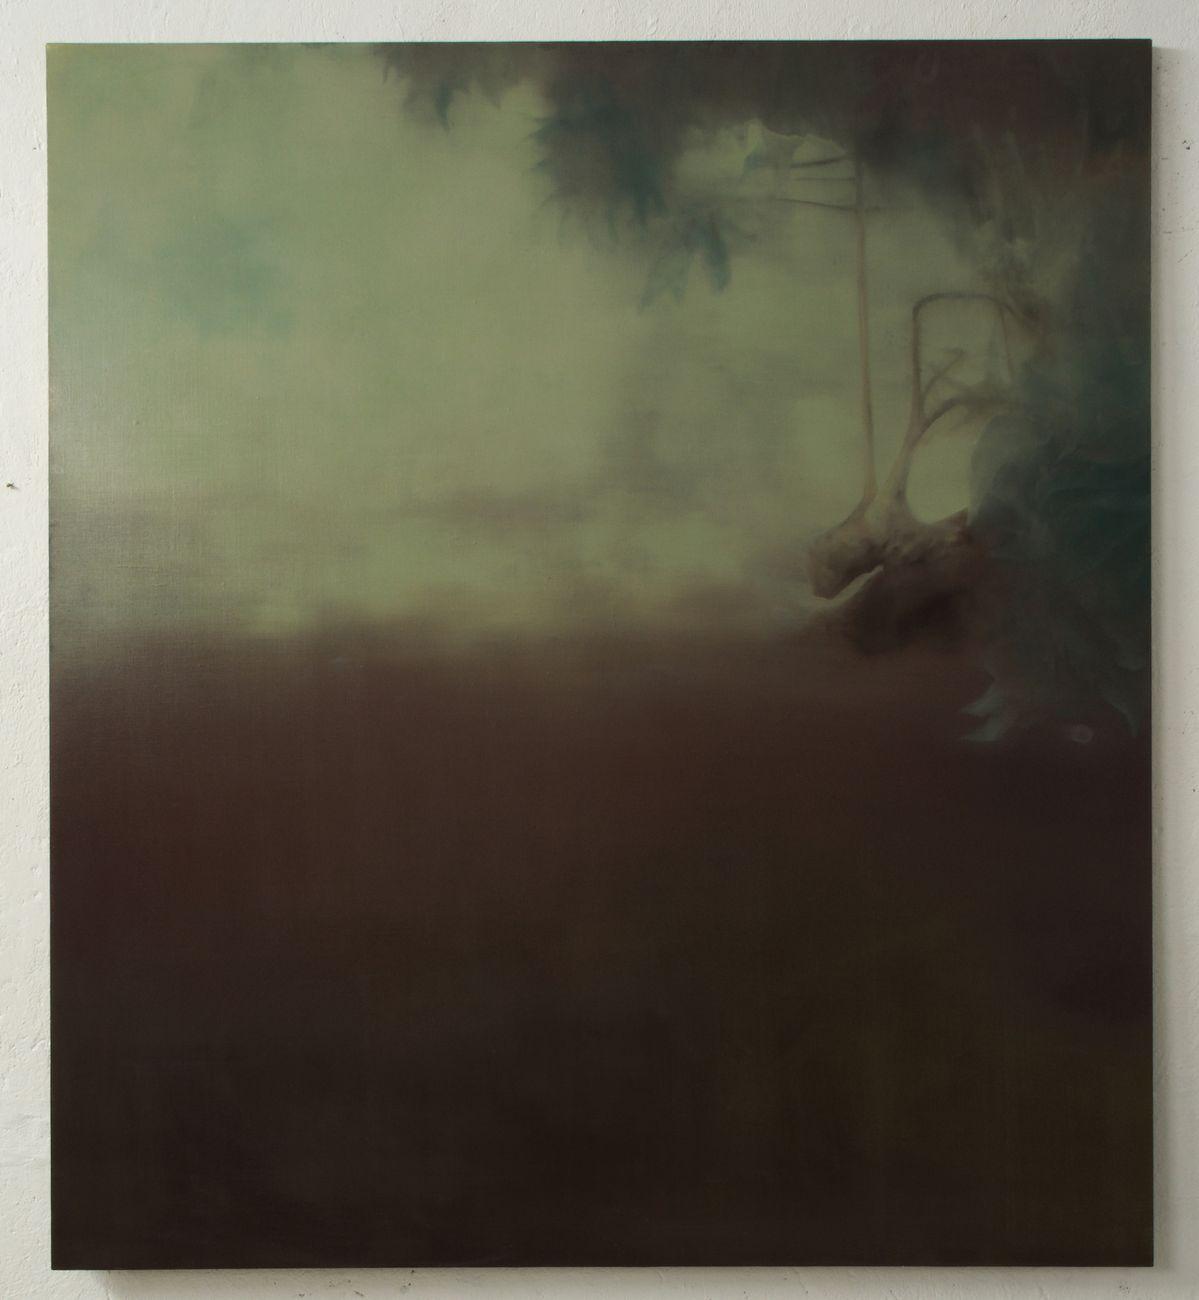 Giulio Saverio Rossi, Die verkehrte Welt #2, 2018, olio su lino, 182x160 cm